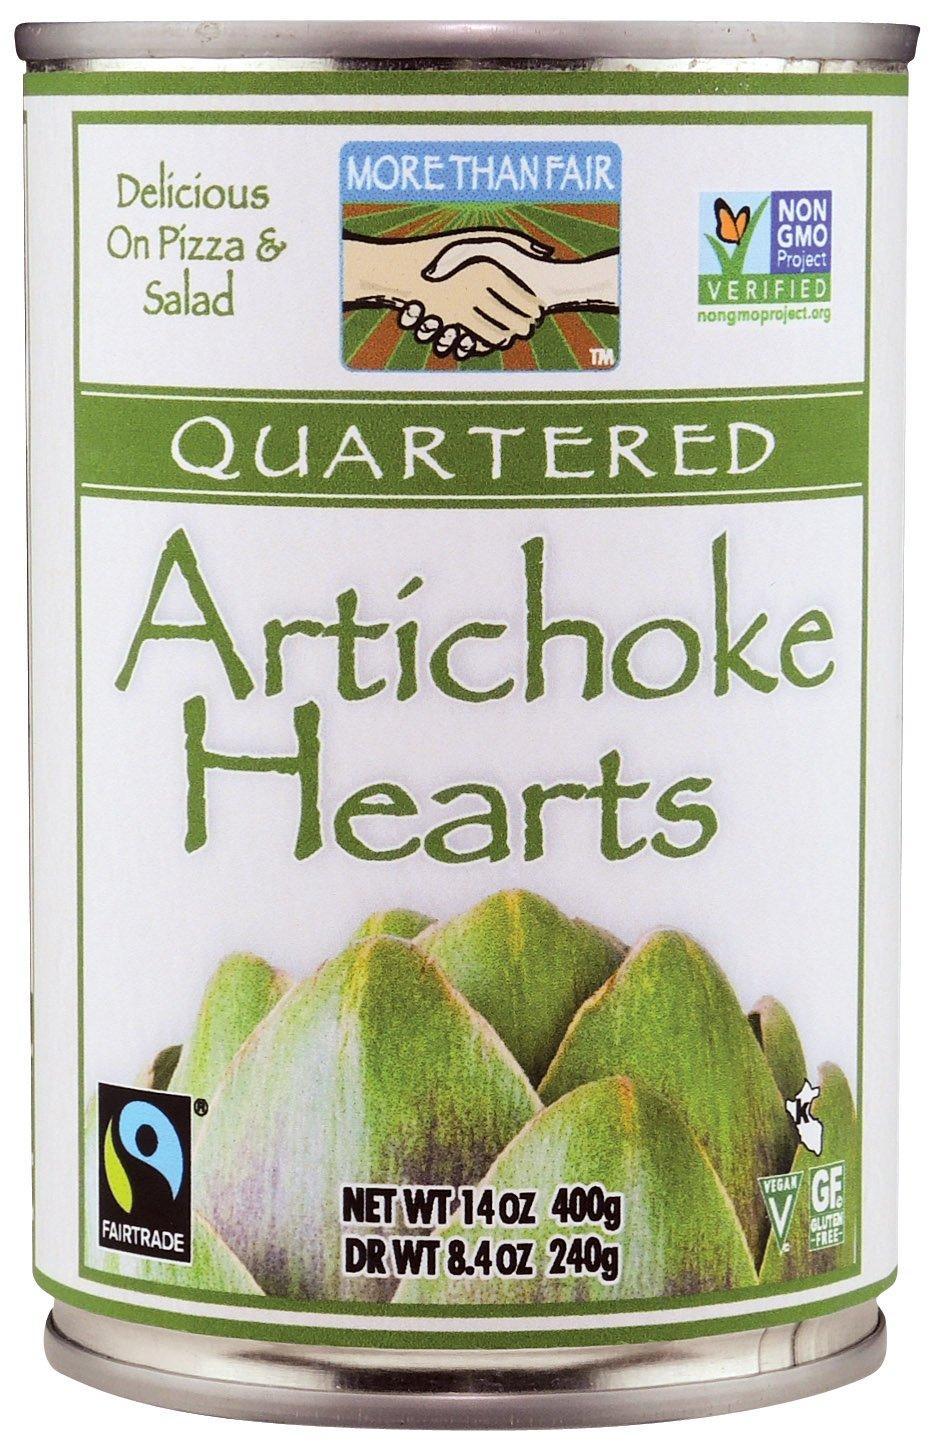 More Than Fair Quartered Artichoke Can Genuine Hearts Ounce Popular brand 14